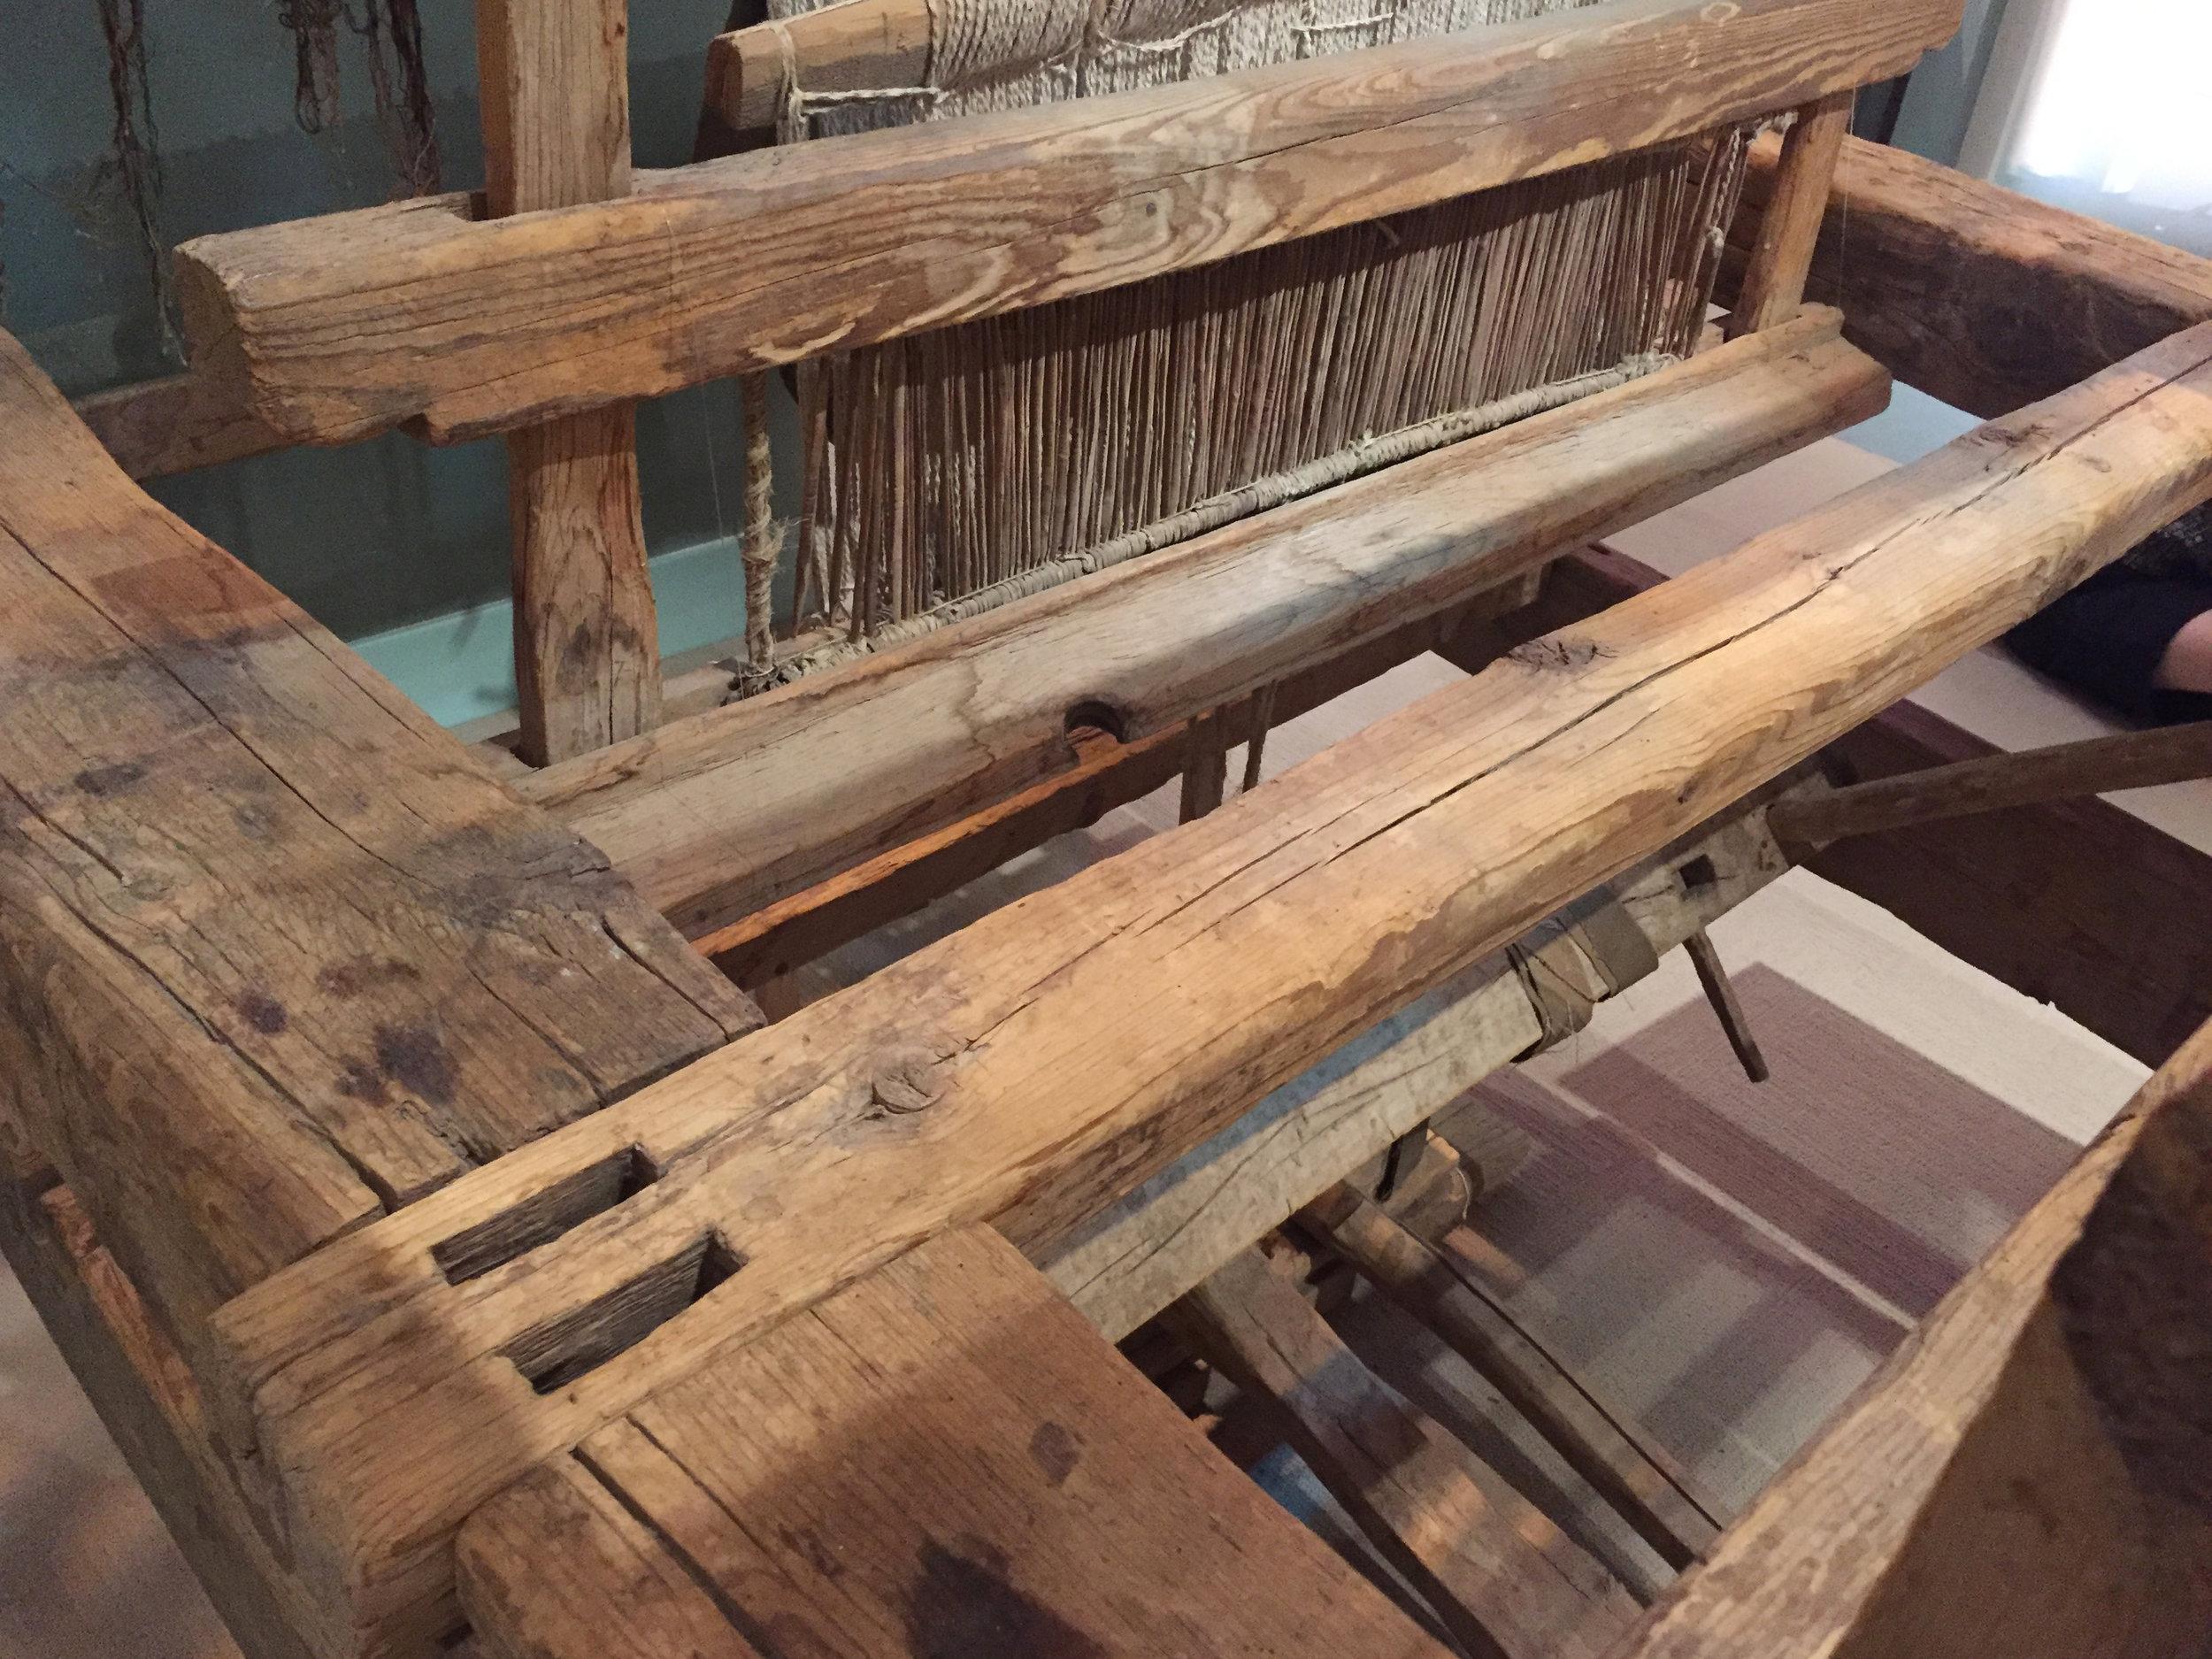 Colonial-Era Rio Grande Floor Loom at the Albuquerque Museum